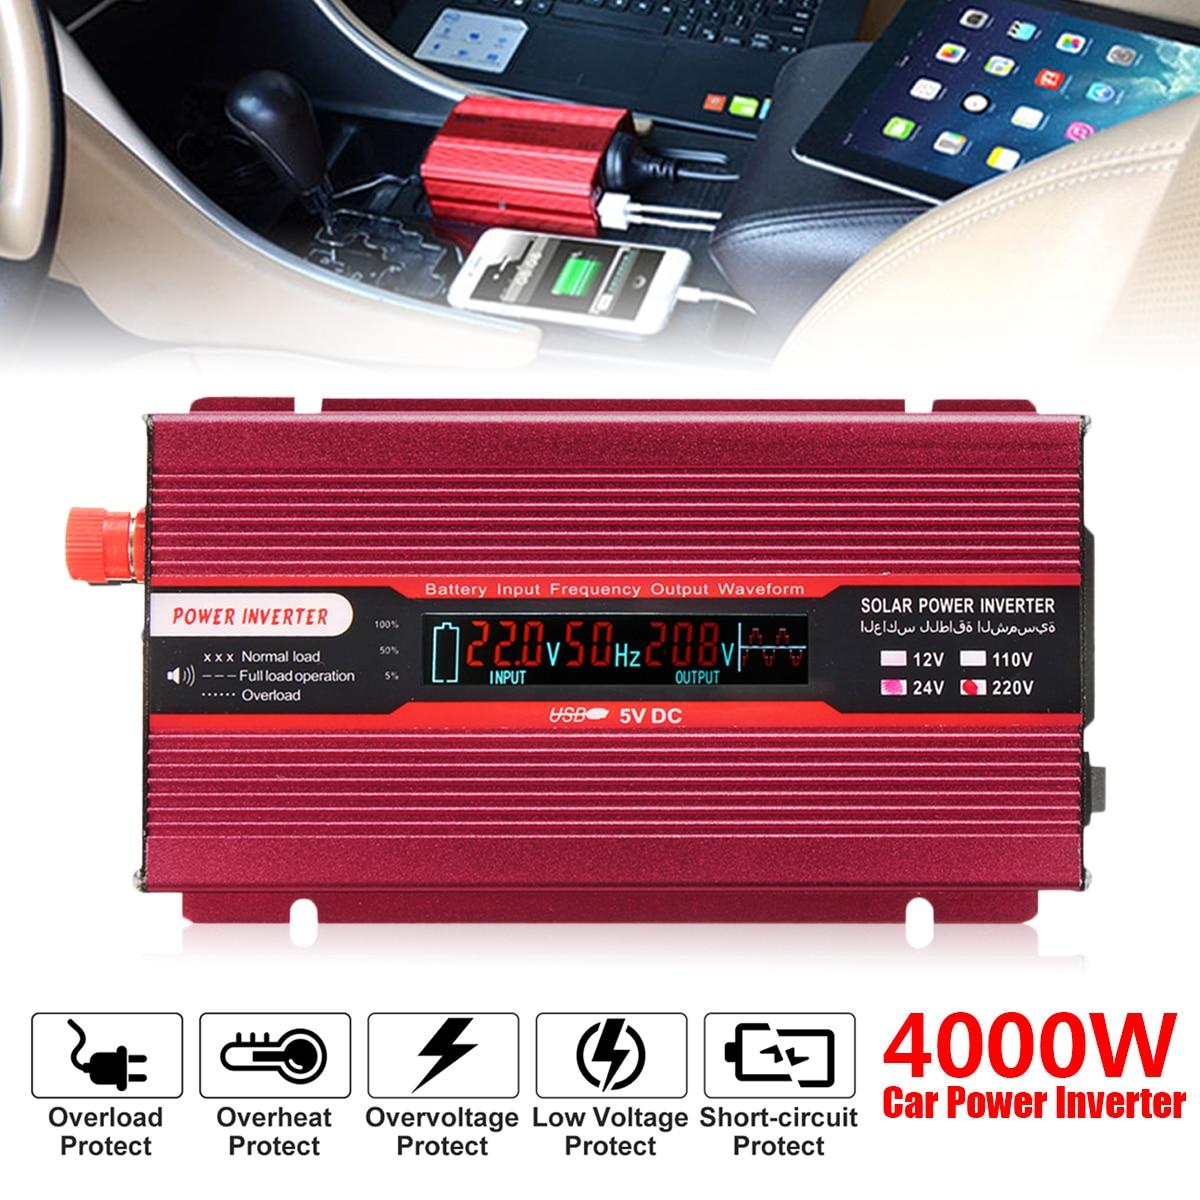 PEAK 4000W Car Power Inverter 12/24V To AC 220/110V USB Modified Sine Wave Converter Low Noise Voltage Transformer Red Aluminum